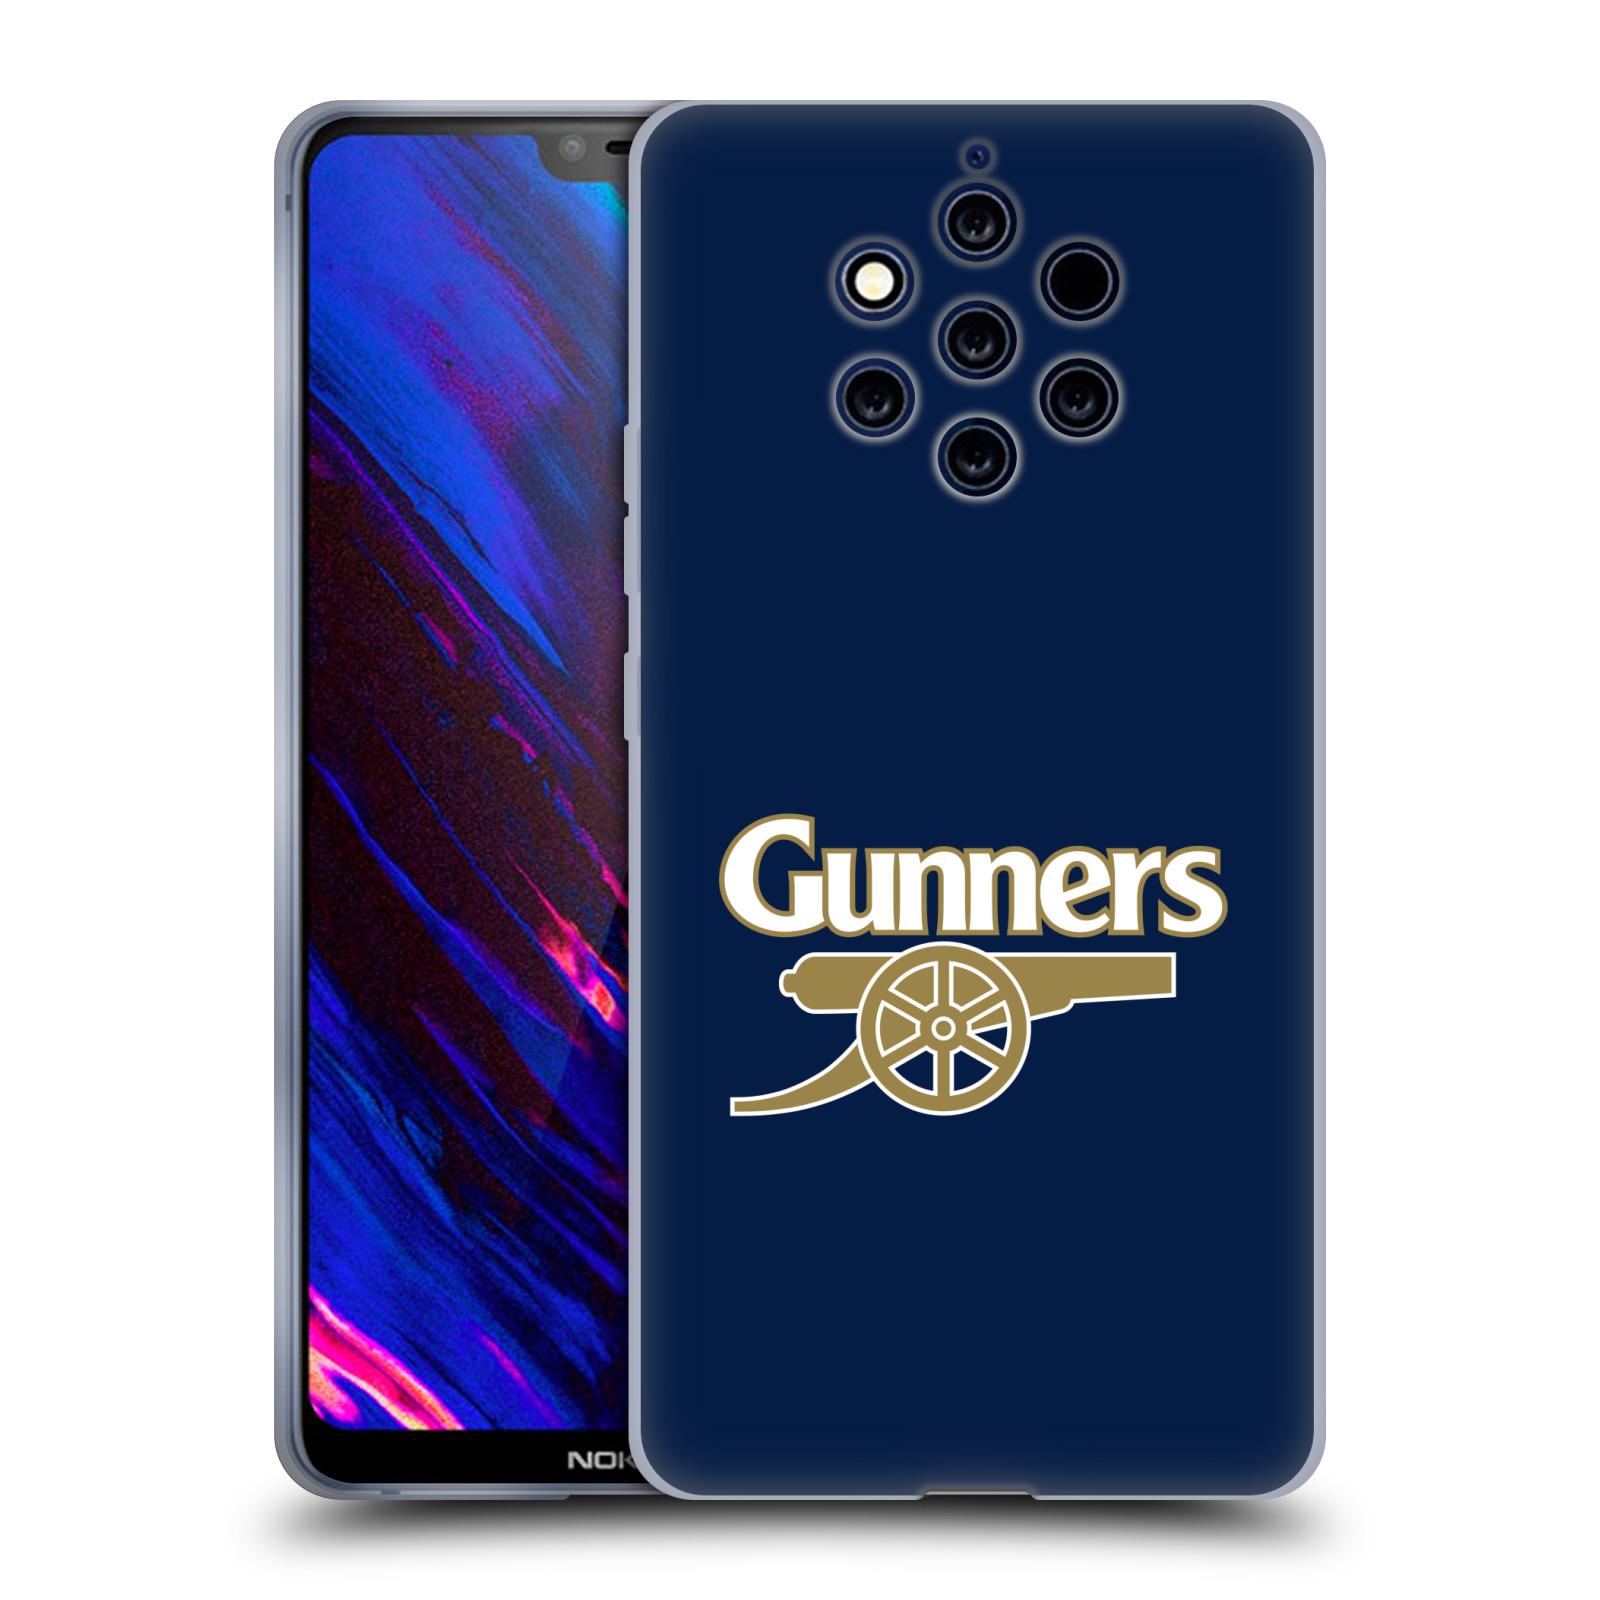 Silikonové pouzdro na mobil Nokia 9 PureView - Head Case - Arsenal FC - Gunners